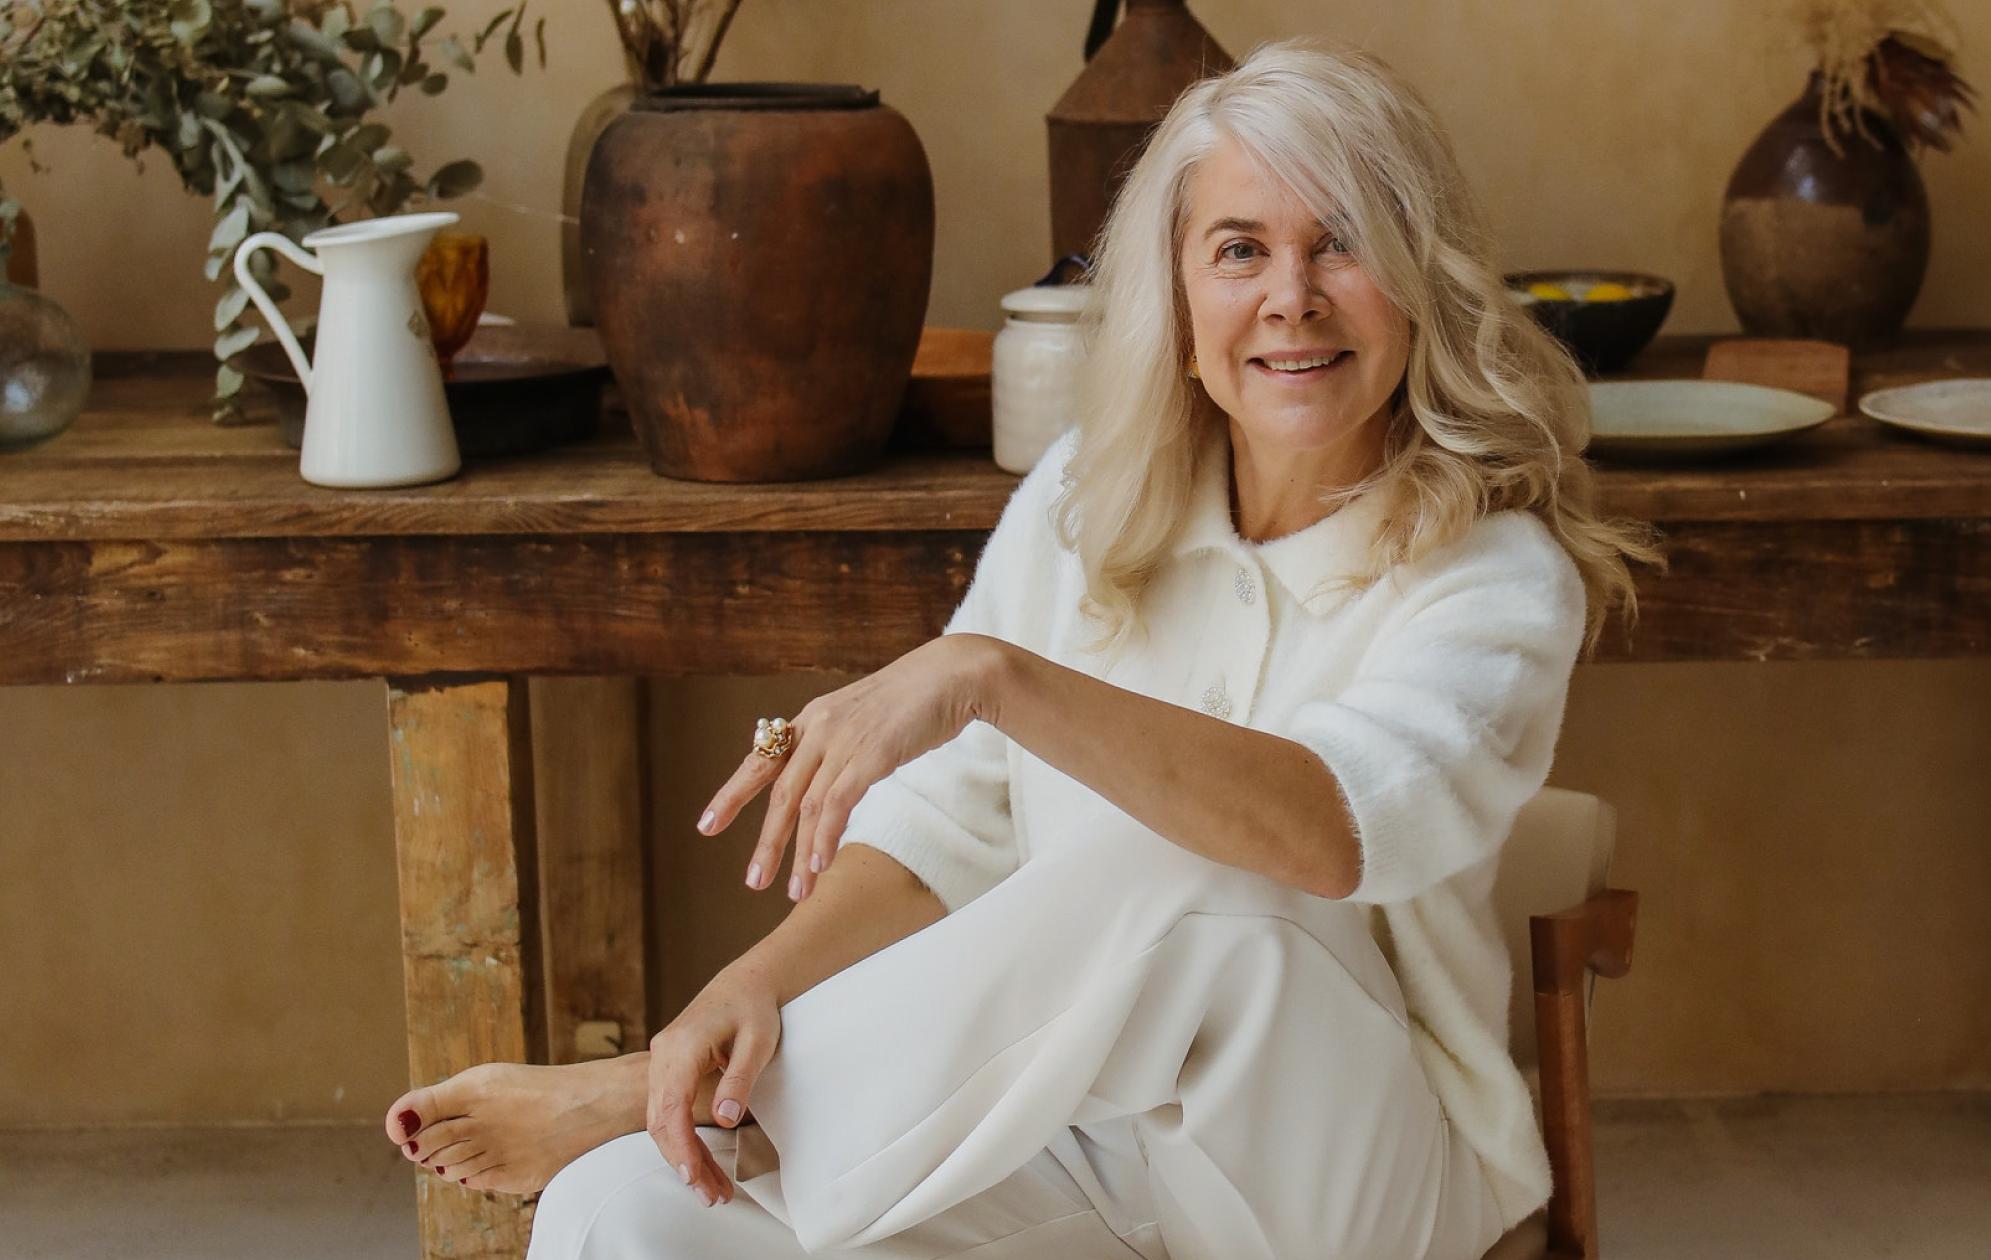 Plenopausia: consejos para lograr una menopausia plena